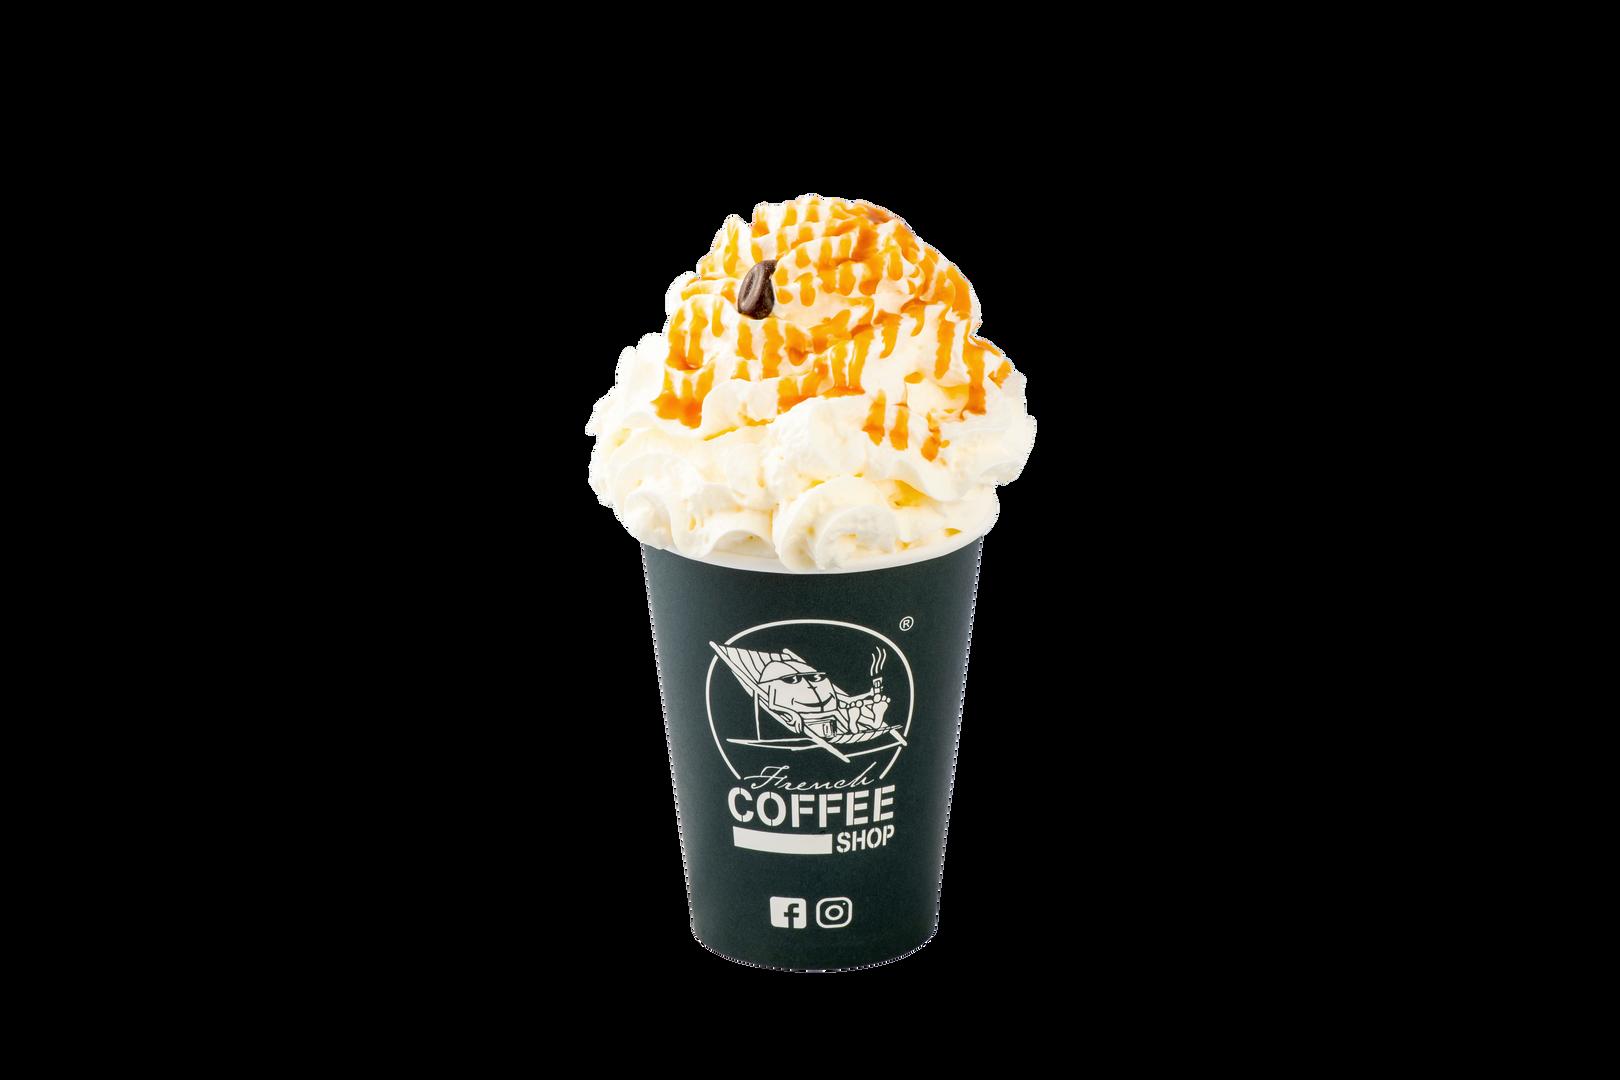 Toffeecoffee